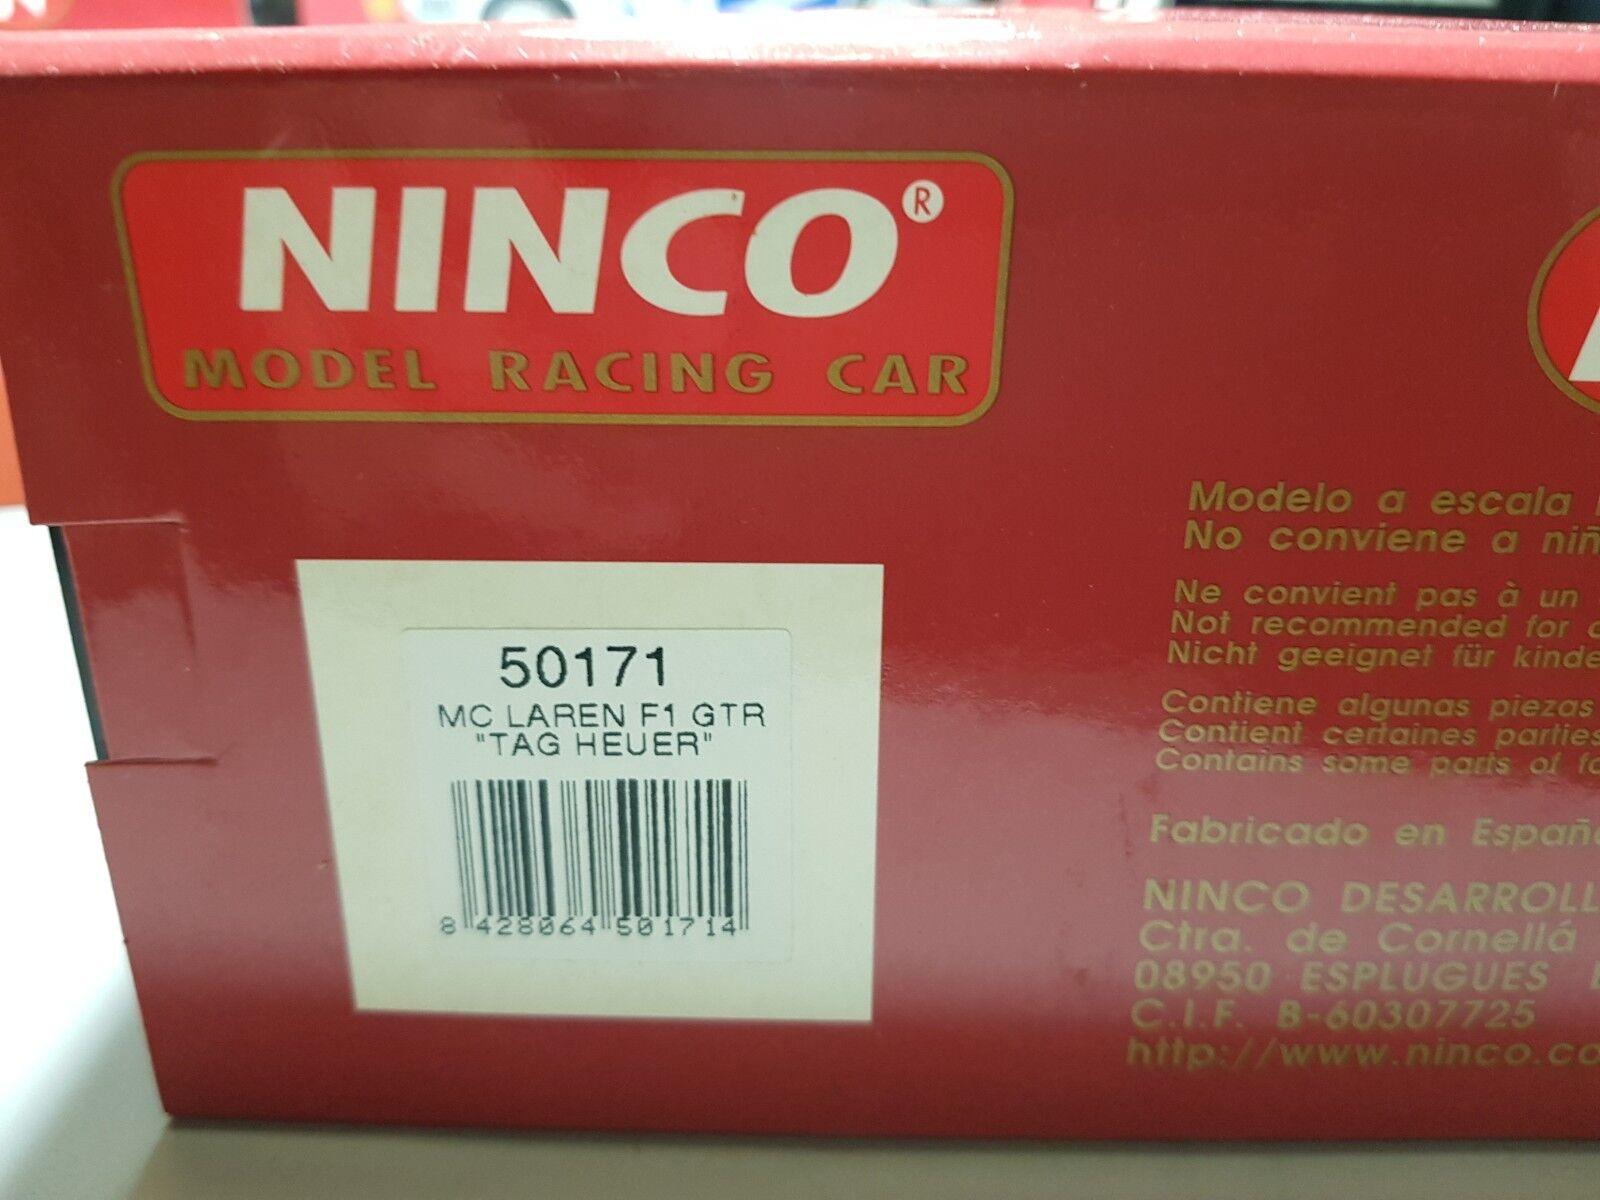 À la fin de l'année, je re re re erai à l'événeHommes t. MCLAREN F1 GTR REF-50171 TAG HEUER NINCO e530b0